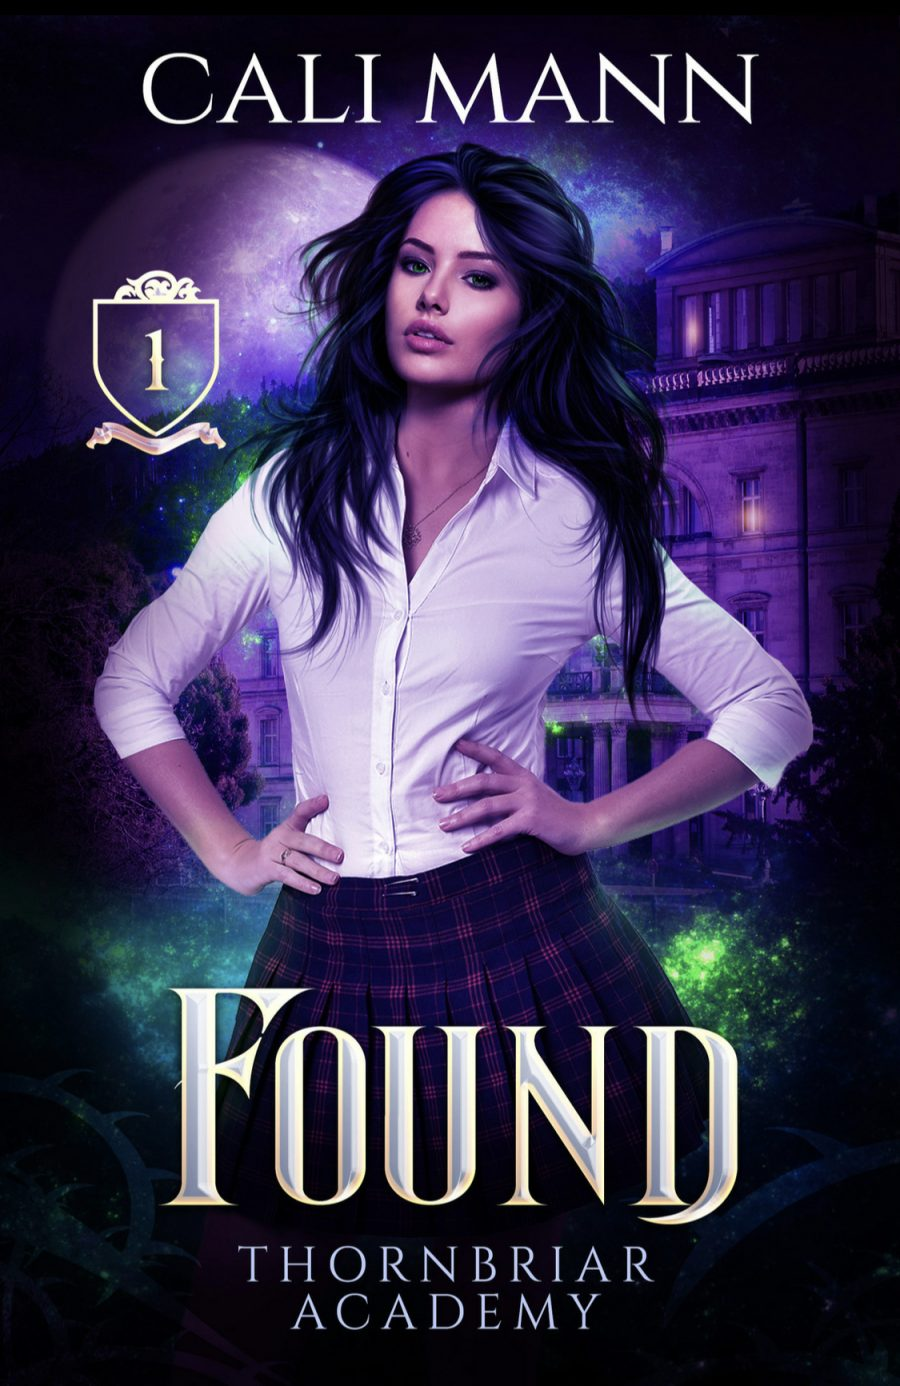 Found (Thornbriar Academy - Book 1) by Cali Mann - A Book Review #BookReview #Academy #MediumBurn #RH #ReverseHarem #WhyChoose #PNR #KindleUnlimited #KU